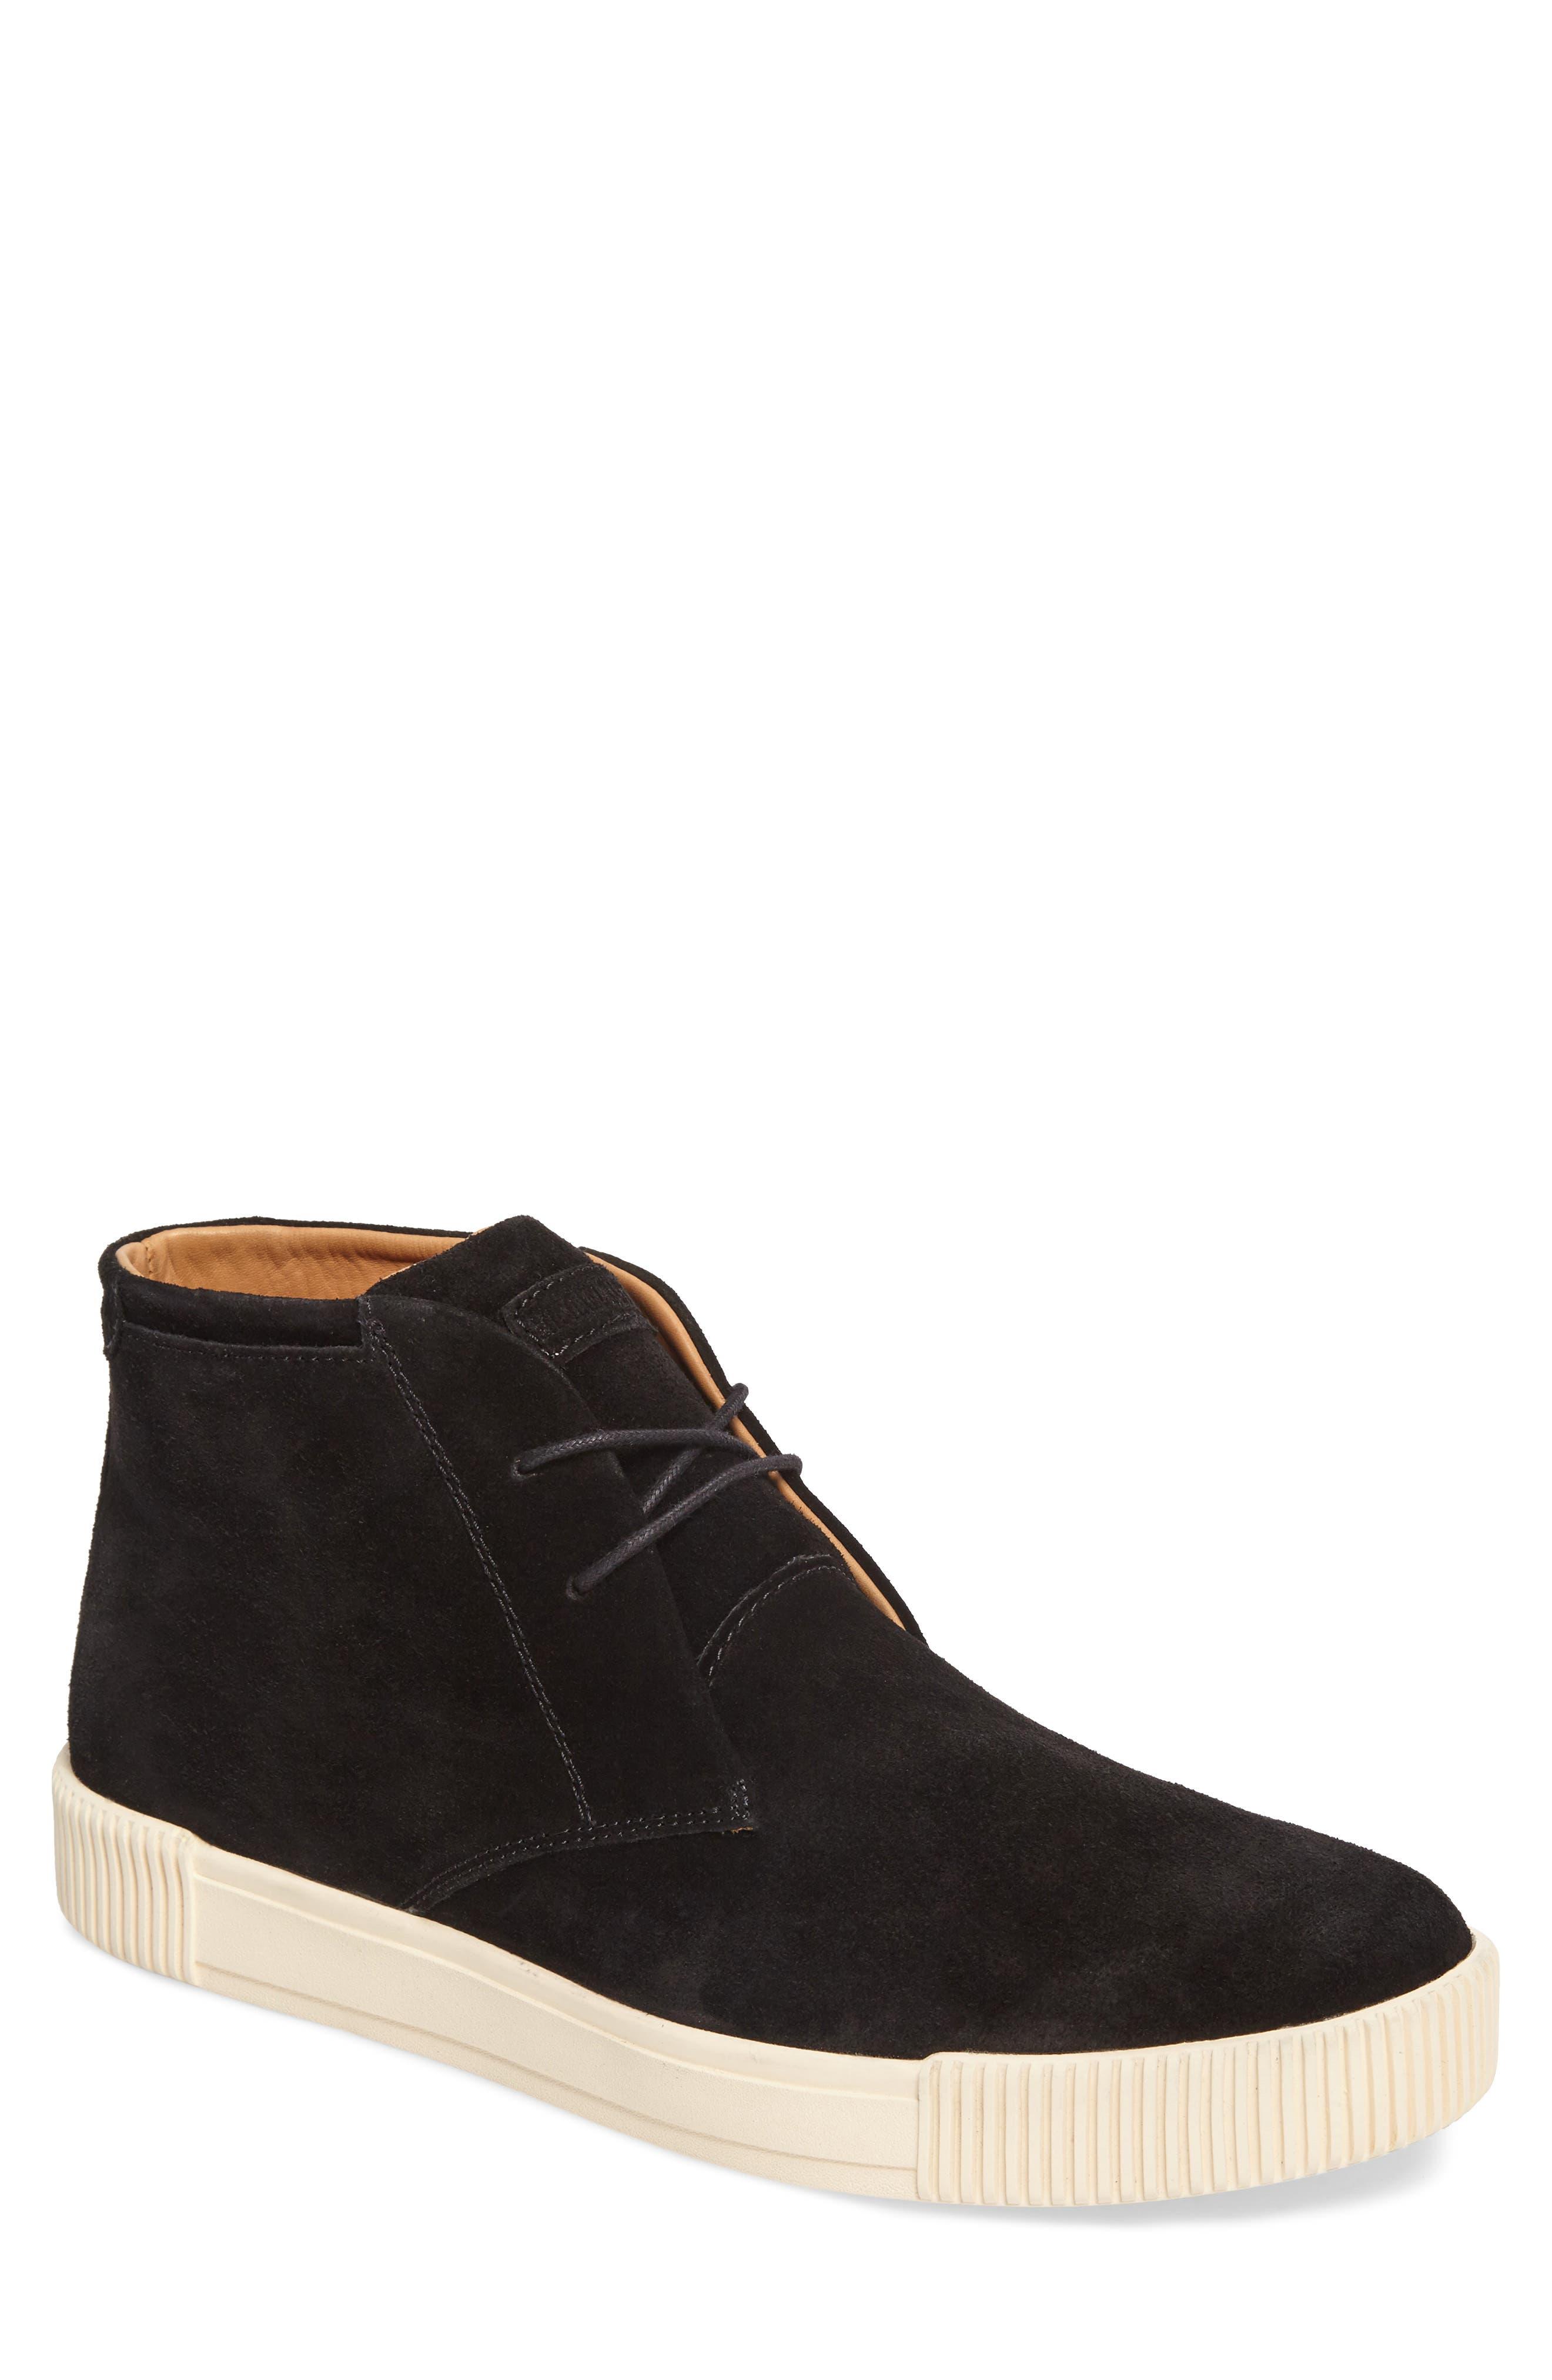 Michael Bastian Lyons Chukka Sneaker